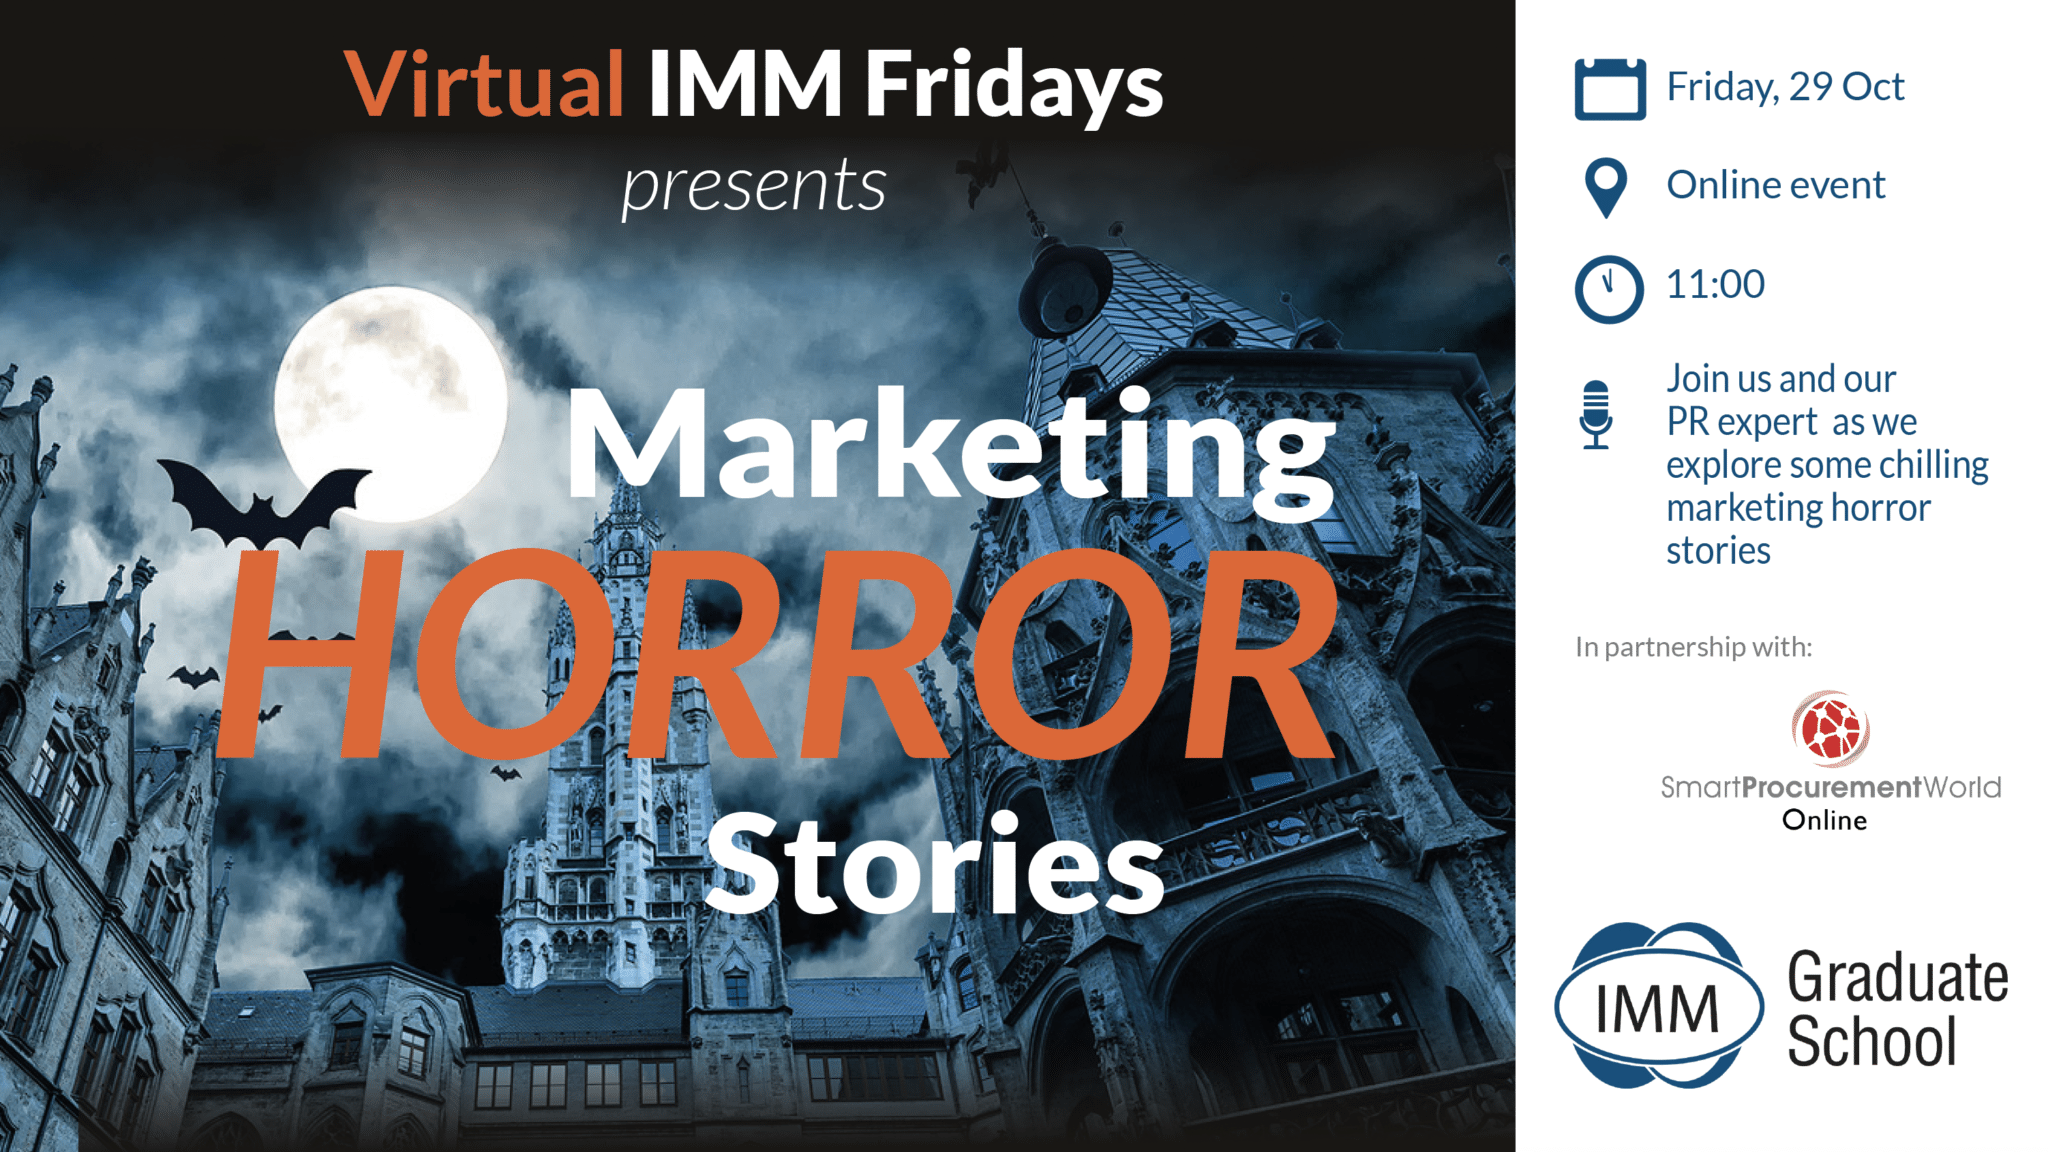 IMM Friday 29 Oct - Horror stories